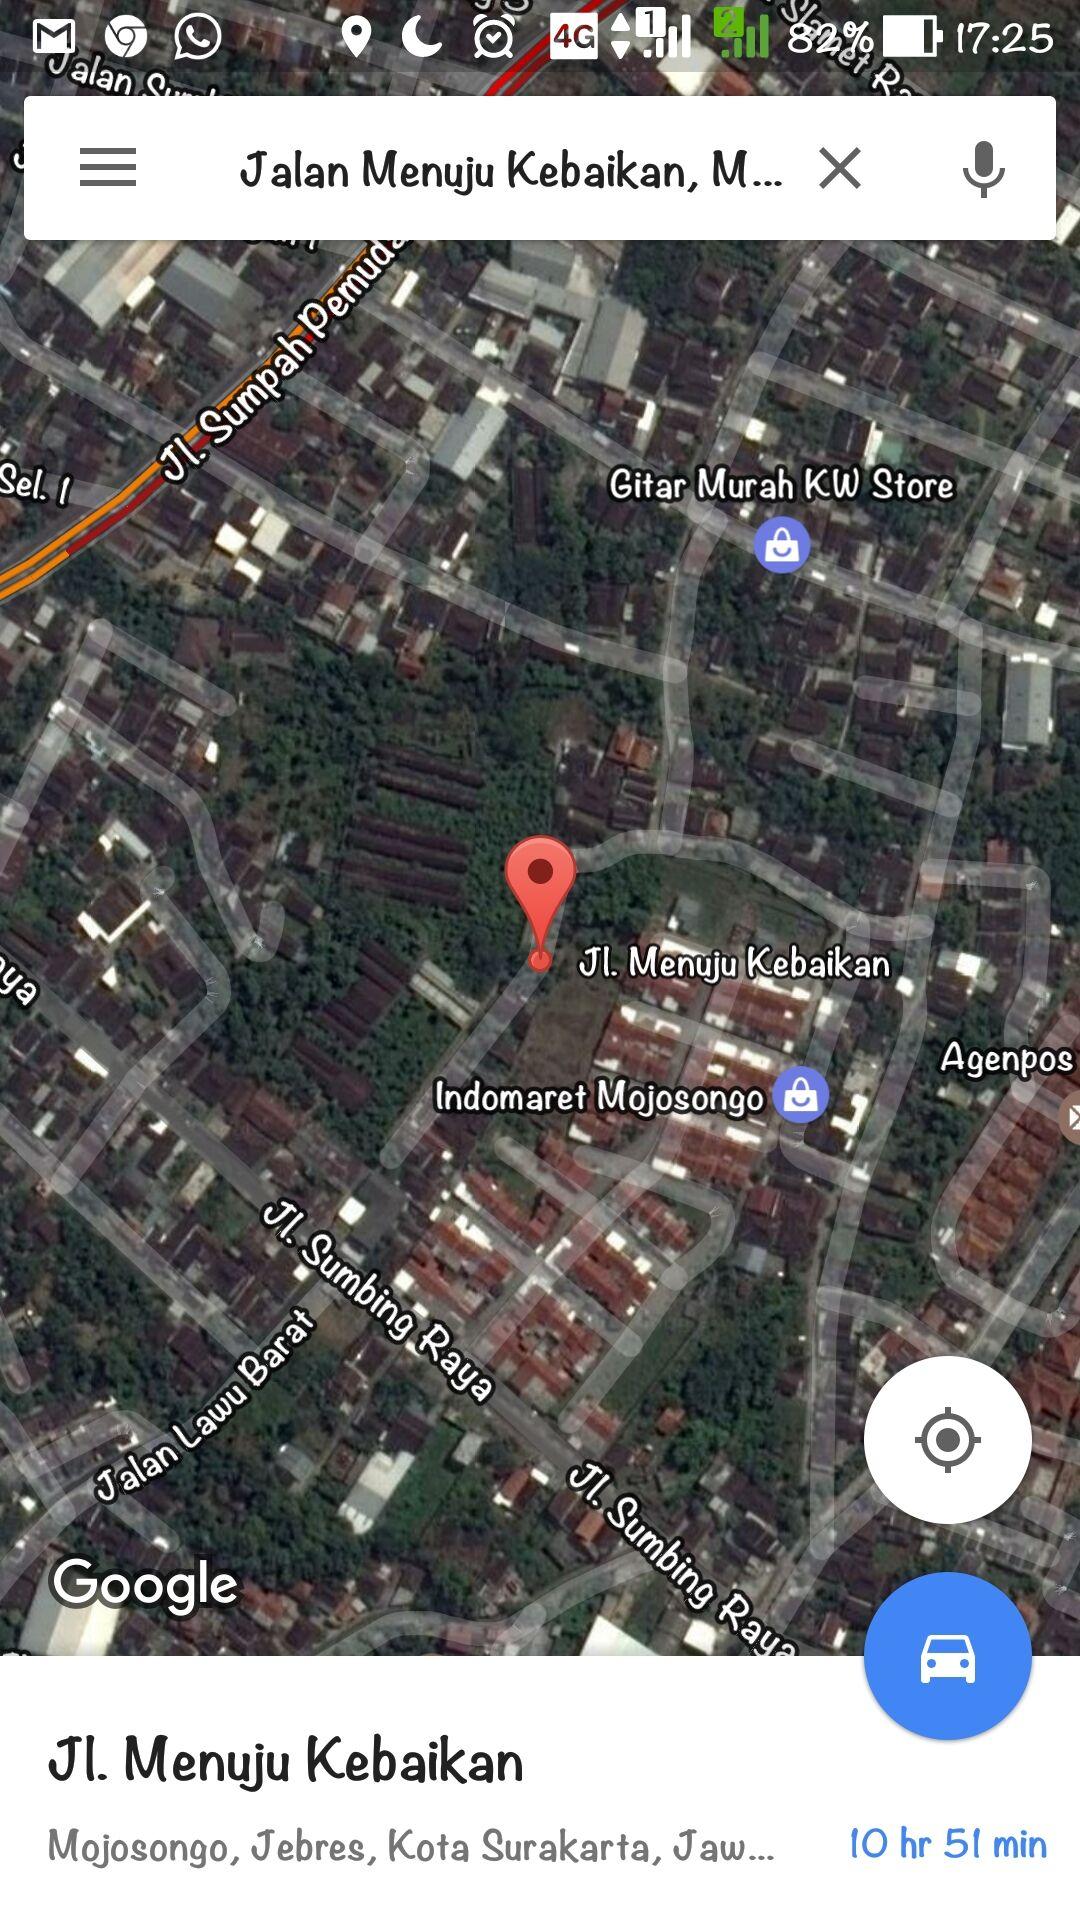 Nama Jalan Aneh Di Google Maps 10